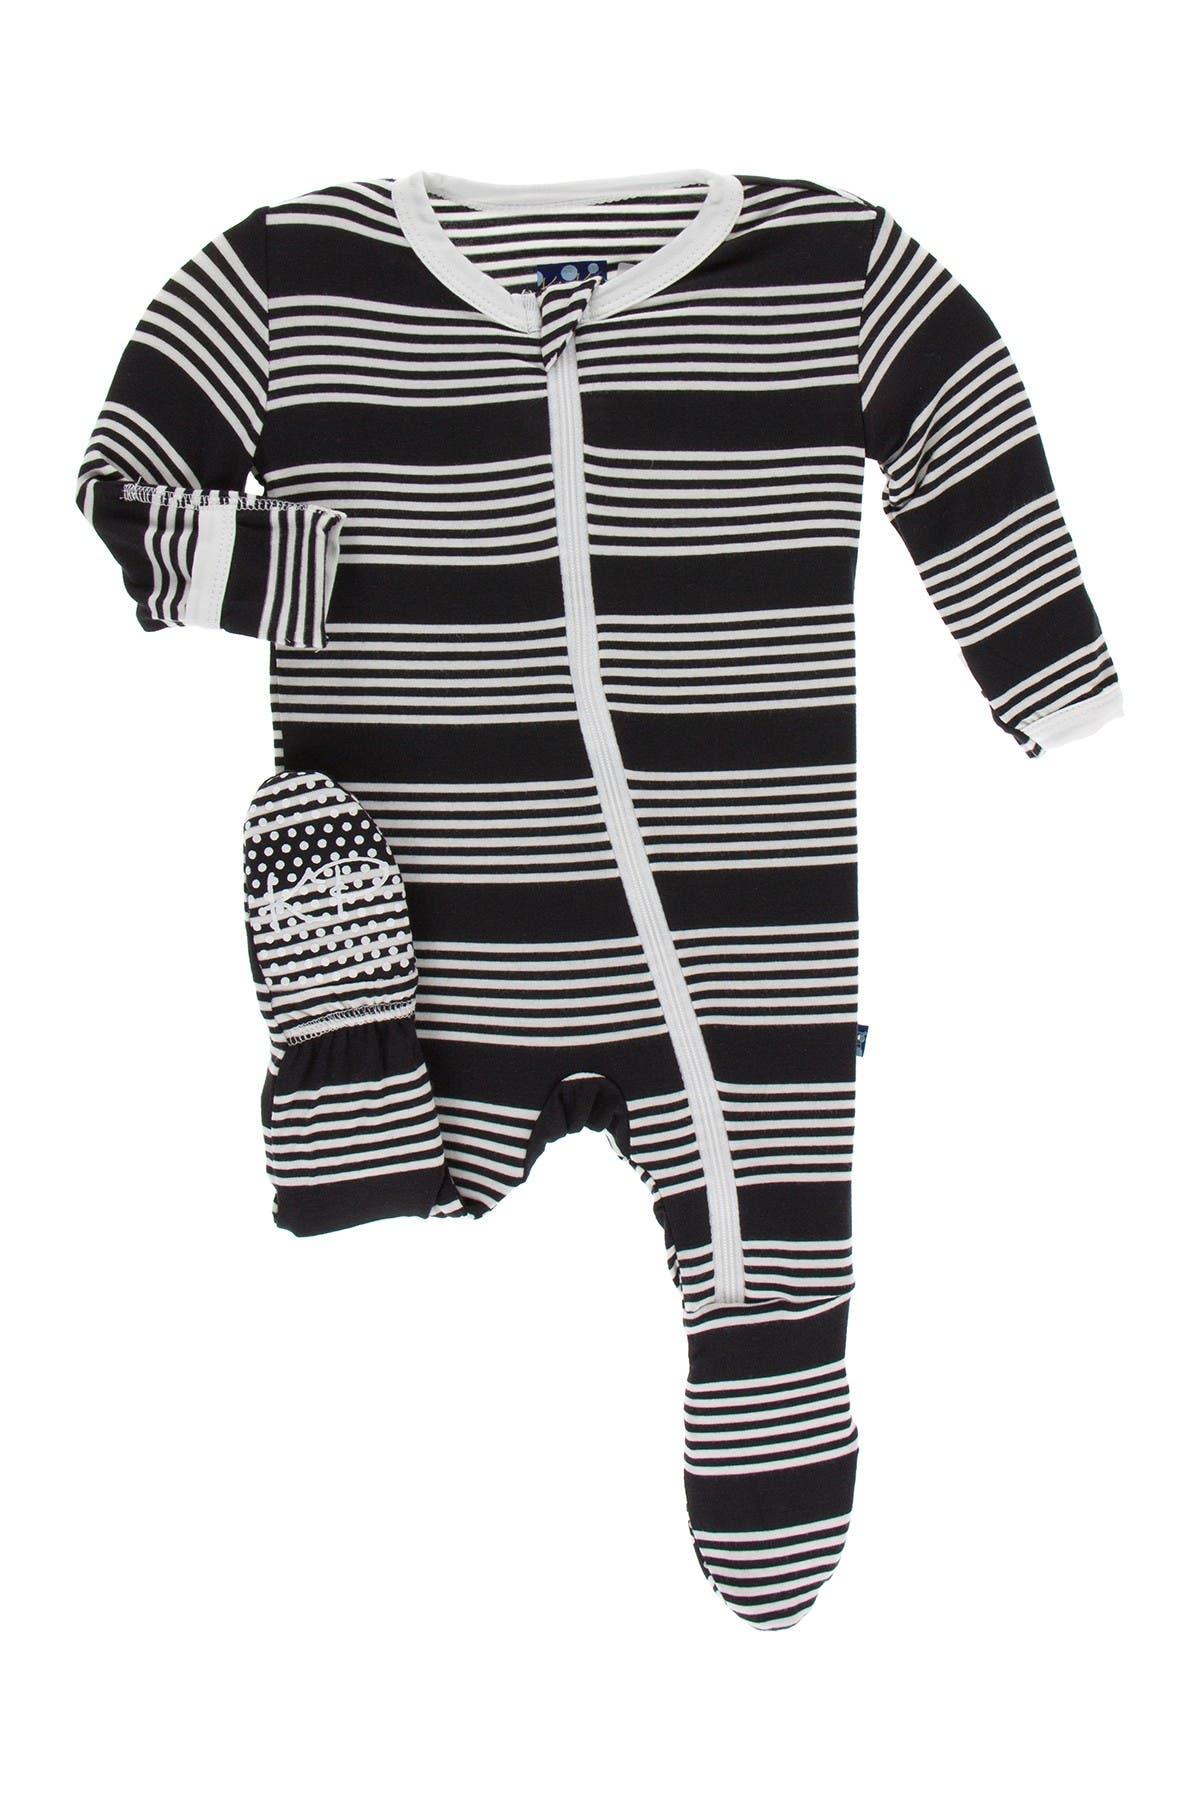 Image of KicKee Pants Print Footie w/ Zipper in Zebra Agriculture Stripe